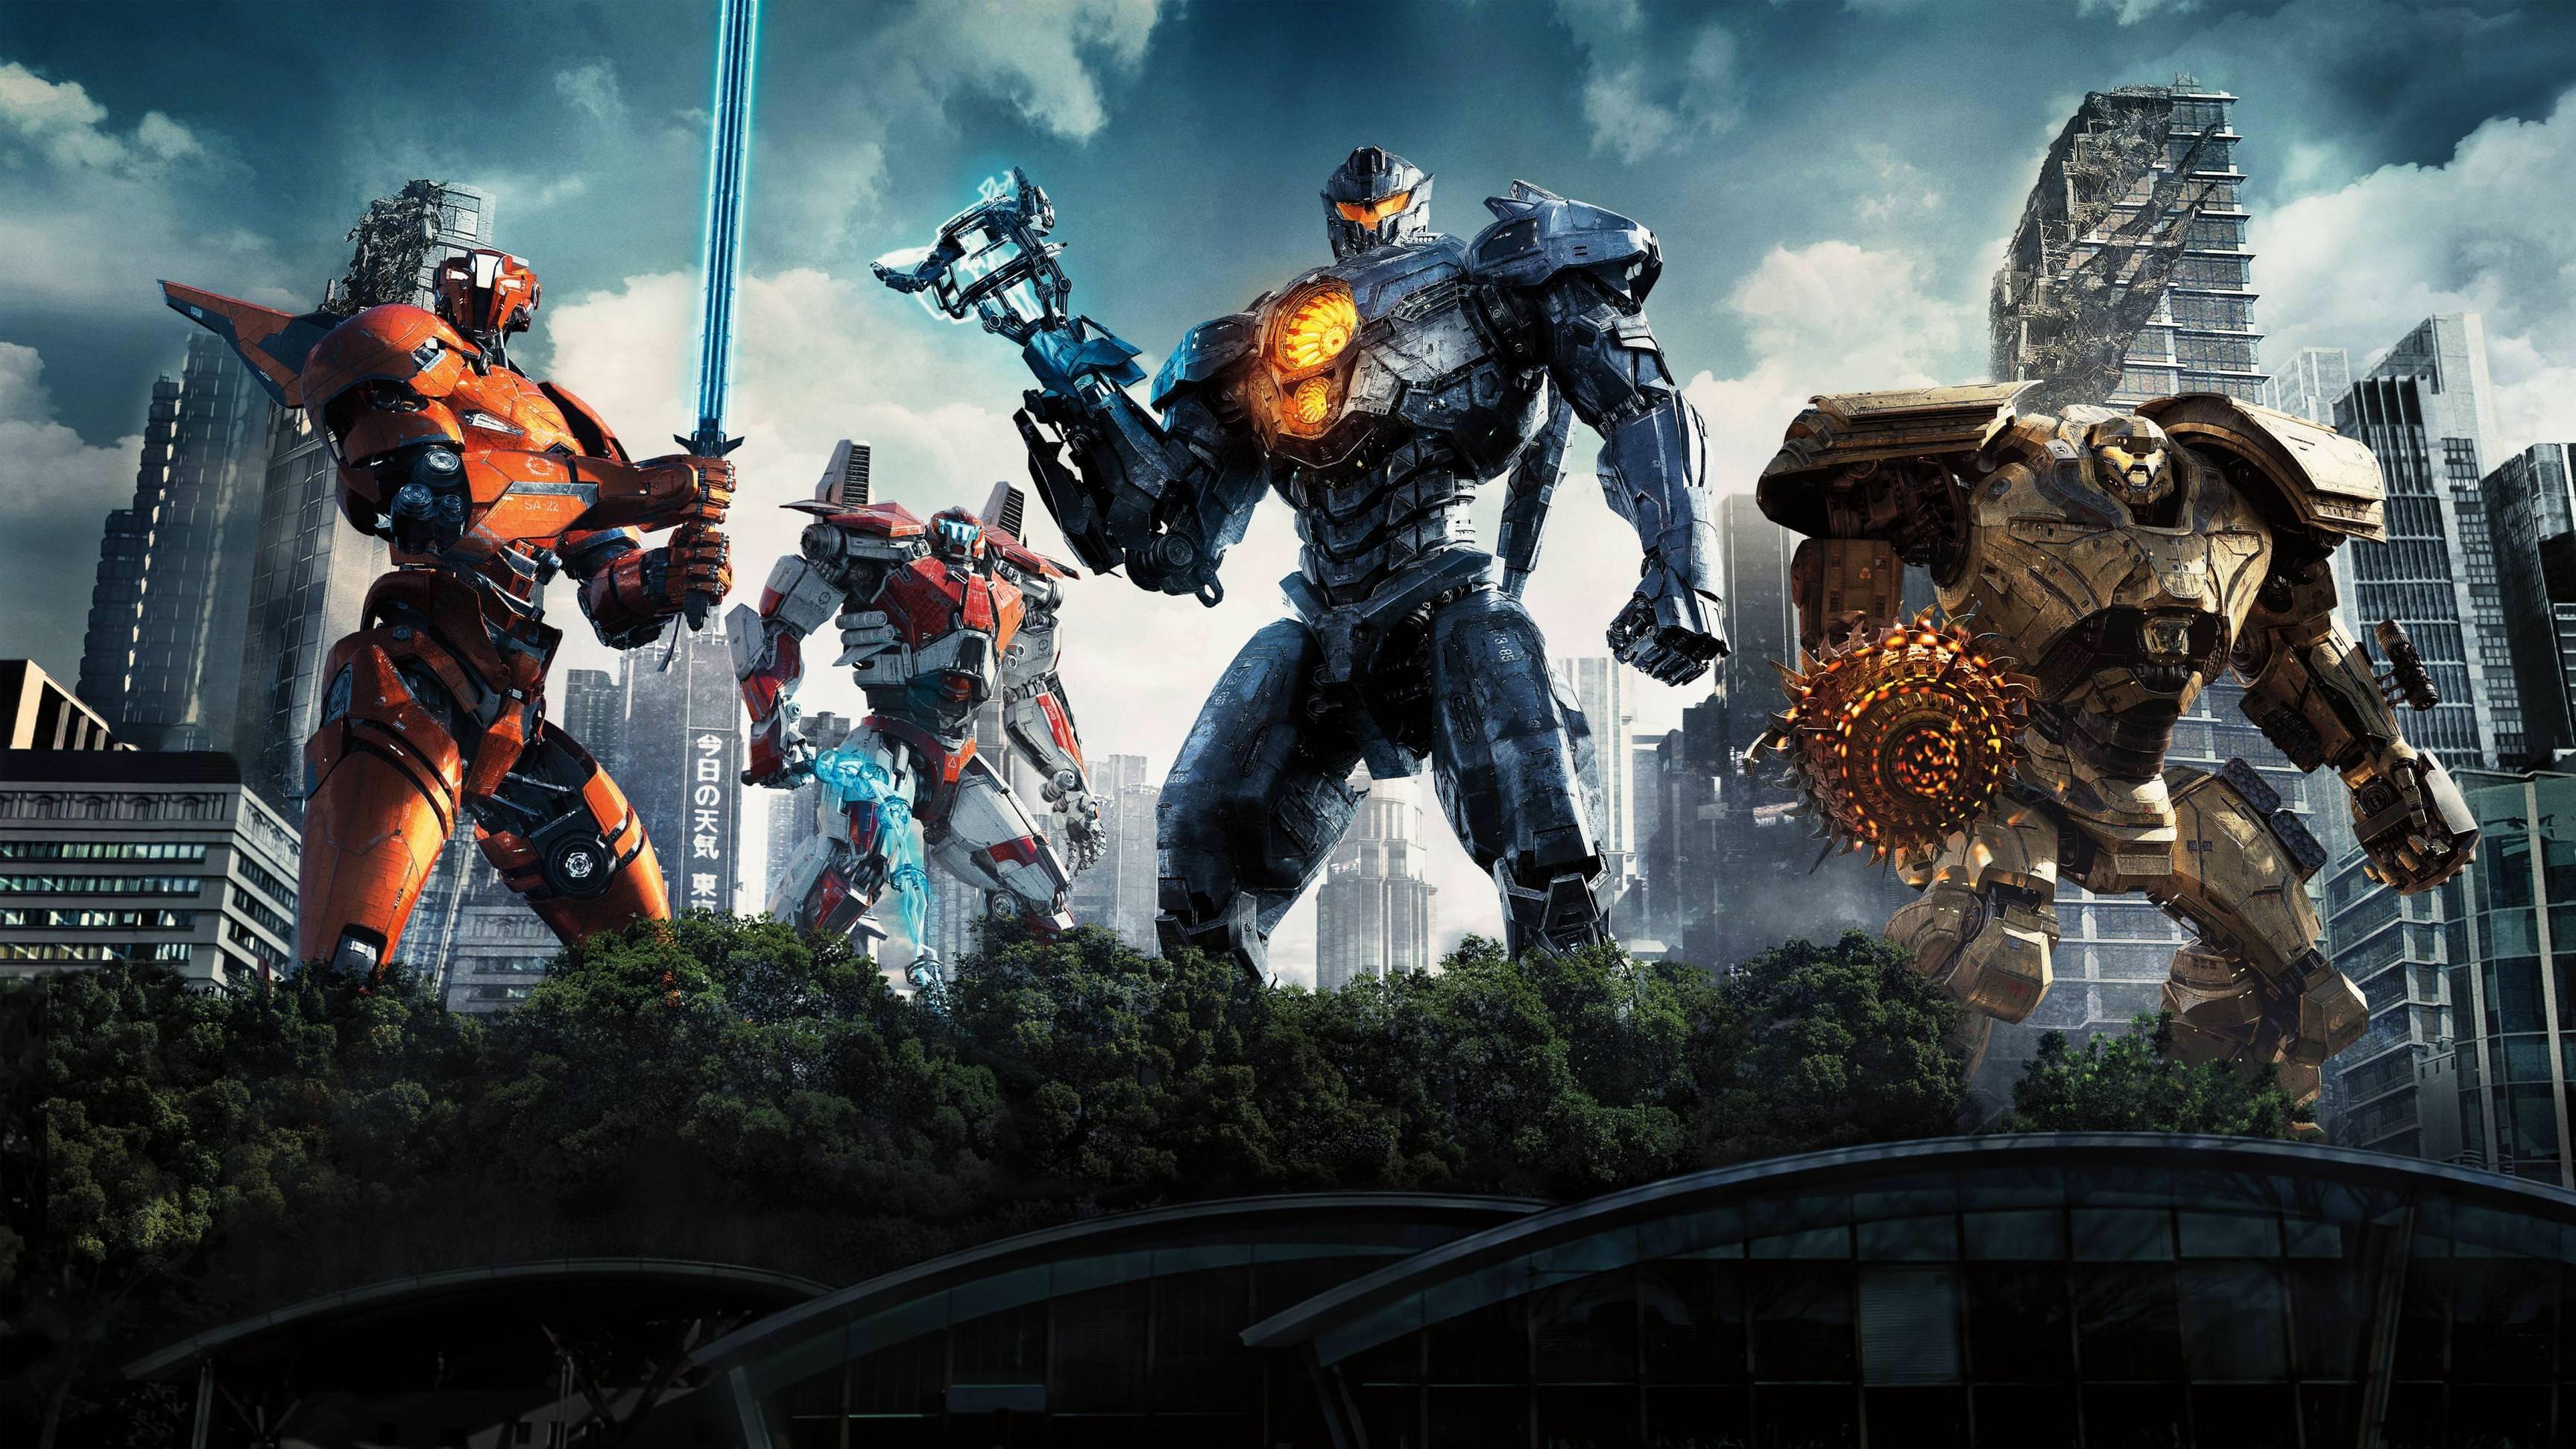 Lockdown In Transformers 4 Movie 4k Resolution Wallpaper